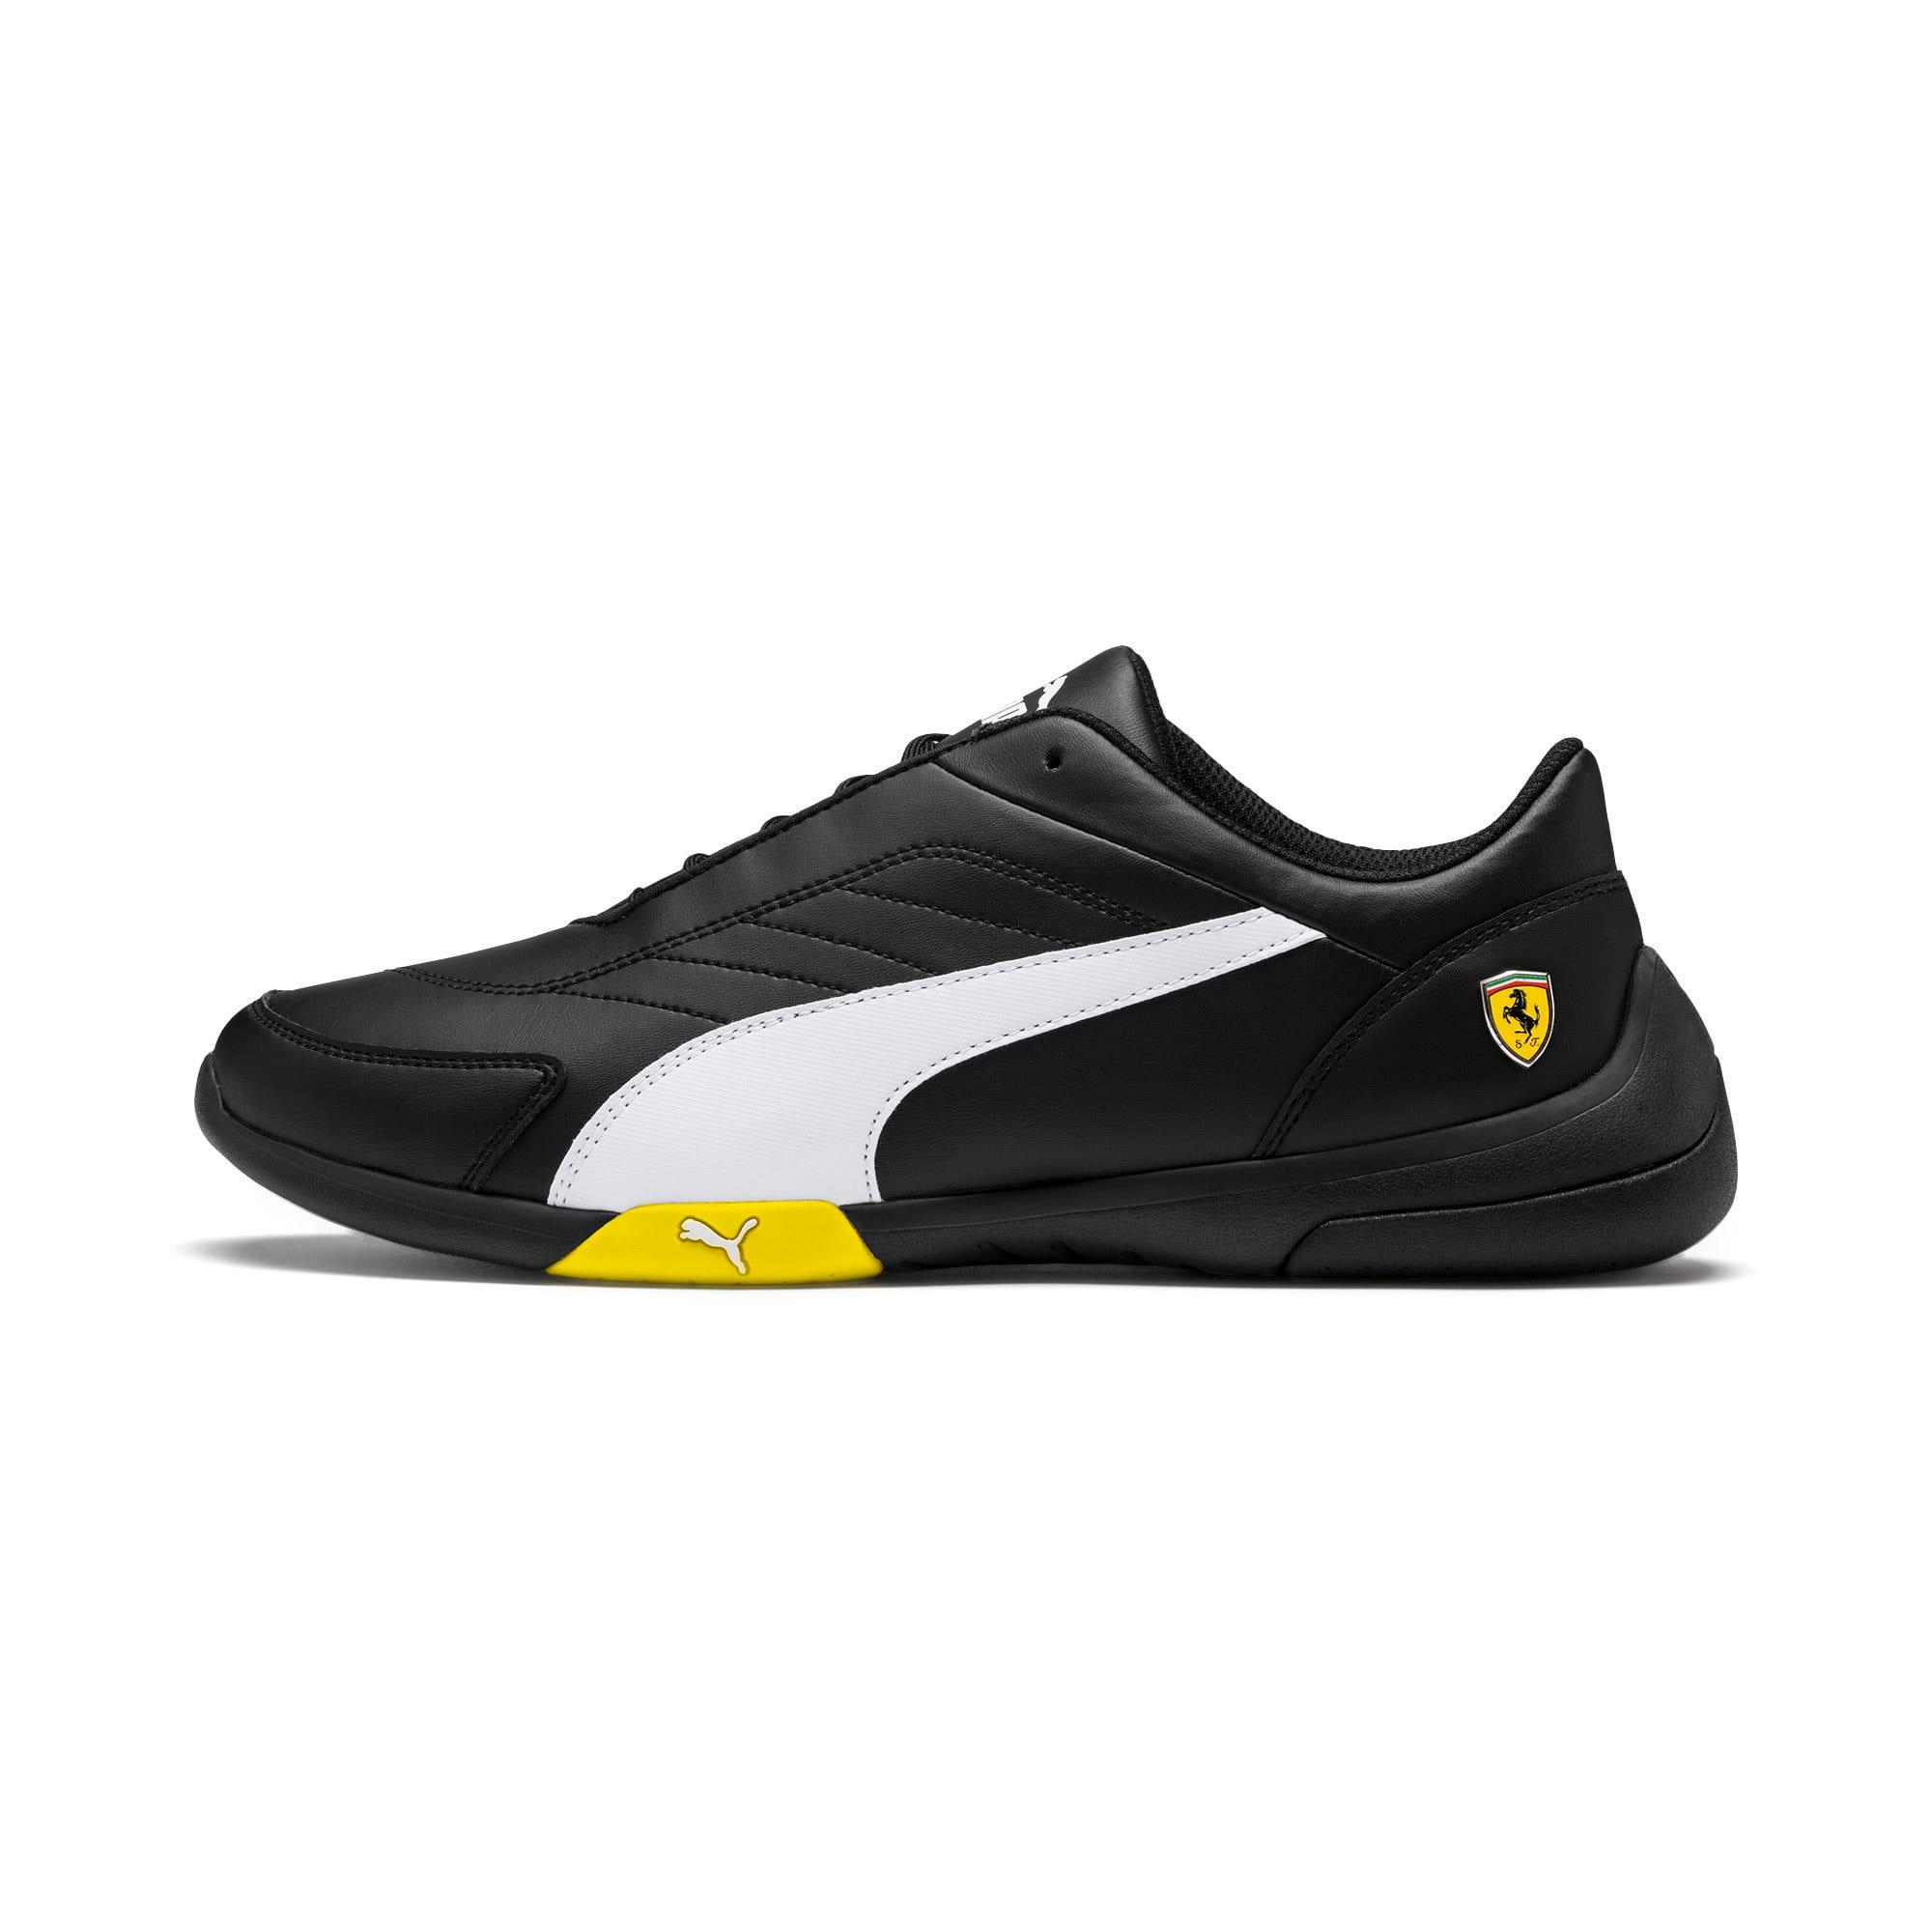 Thumbnail 1 of Scuderia Ferrari Kart Cat III Shoes, Black-White-Blazing Yellow, medium